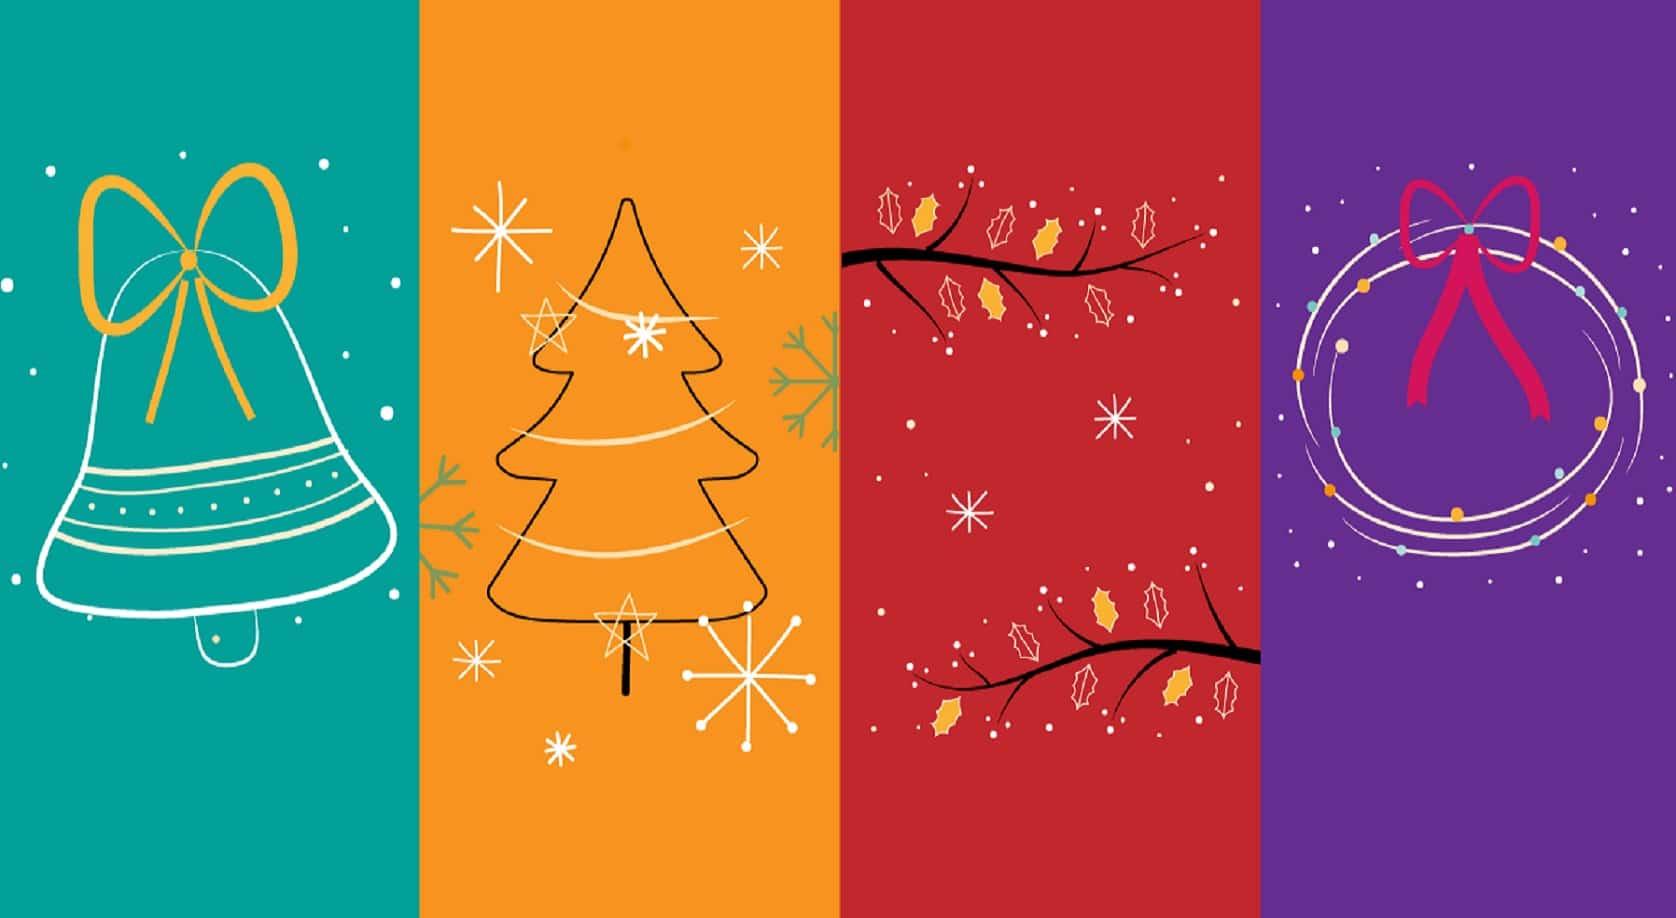 Calendrier des 4 semaines 2017 : Noël avant Noël